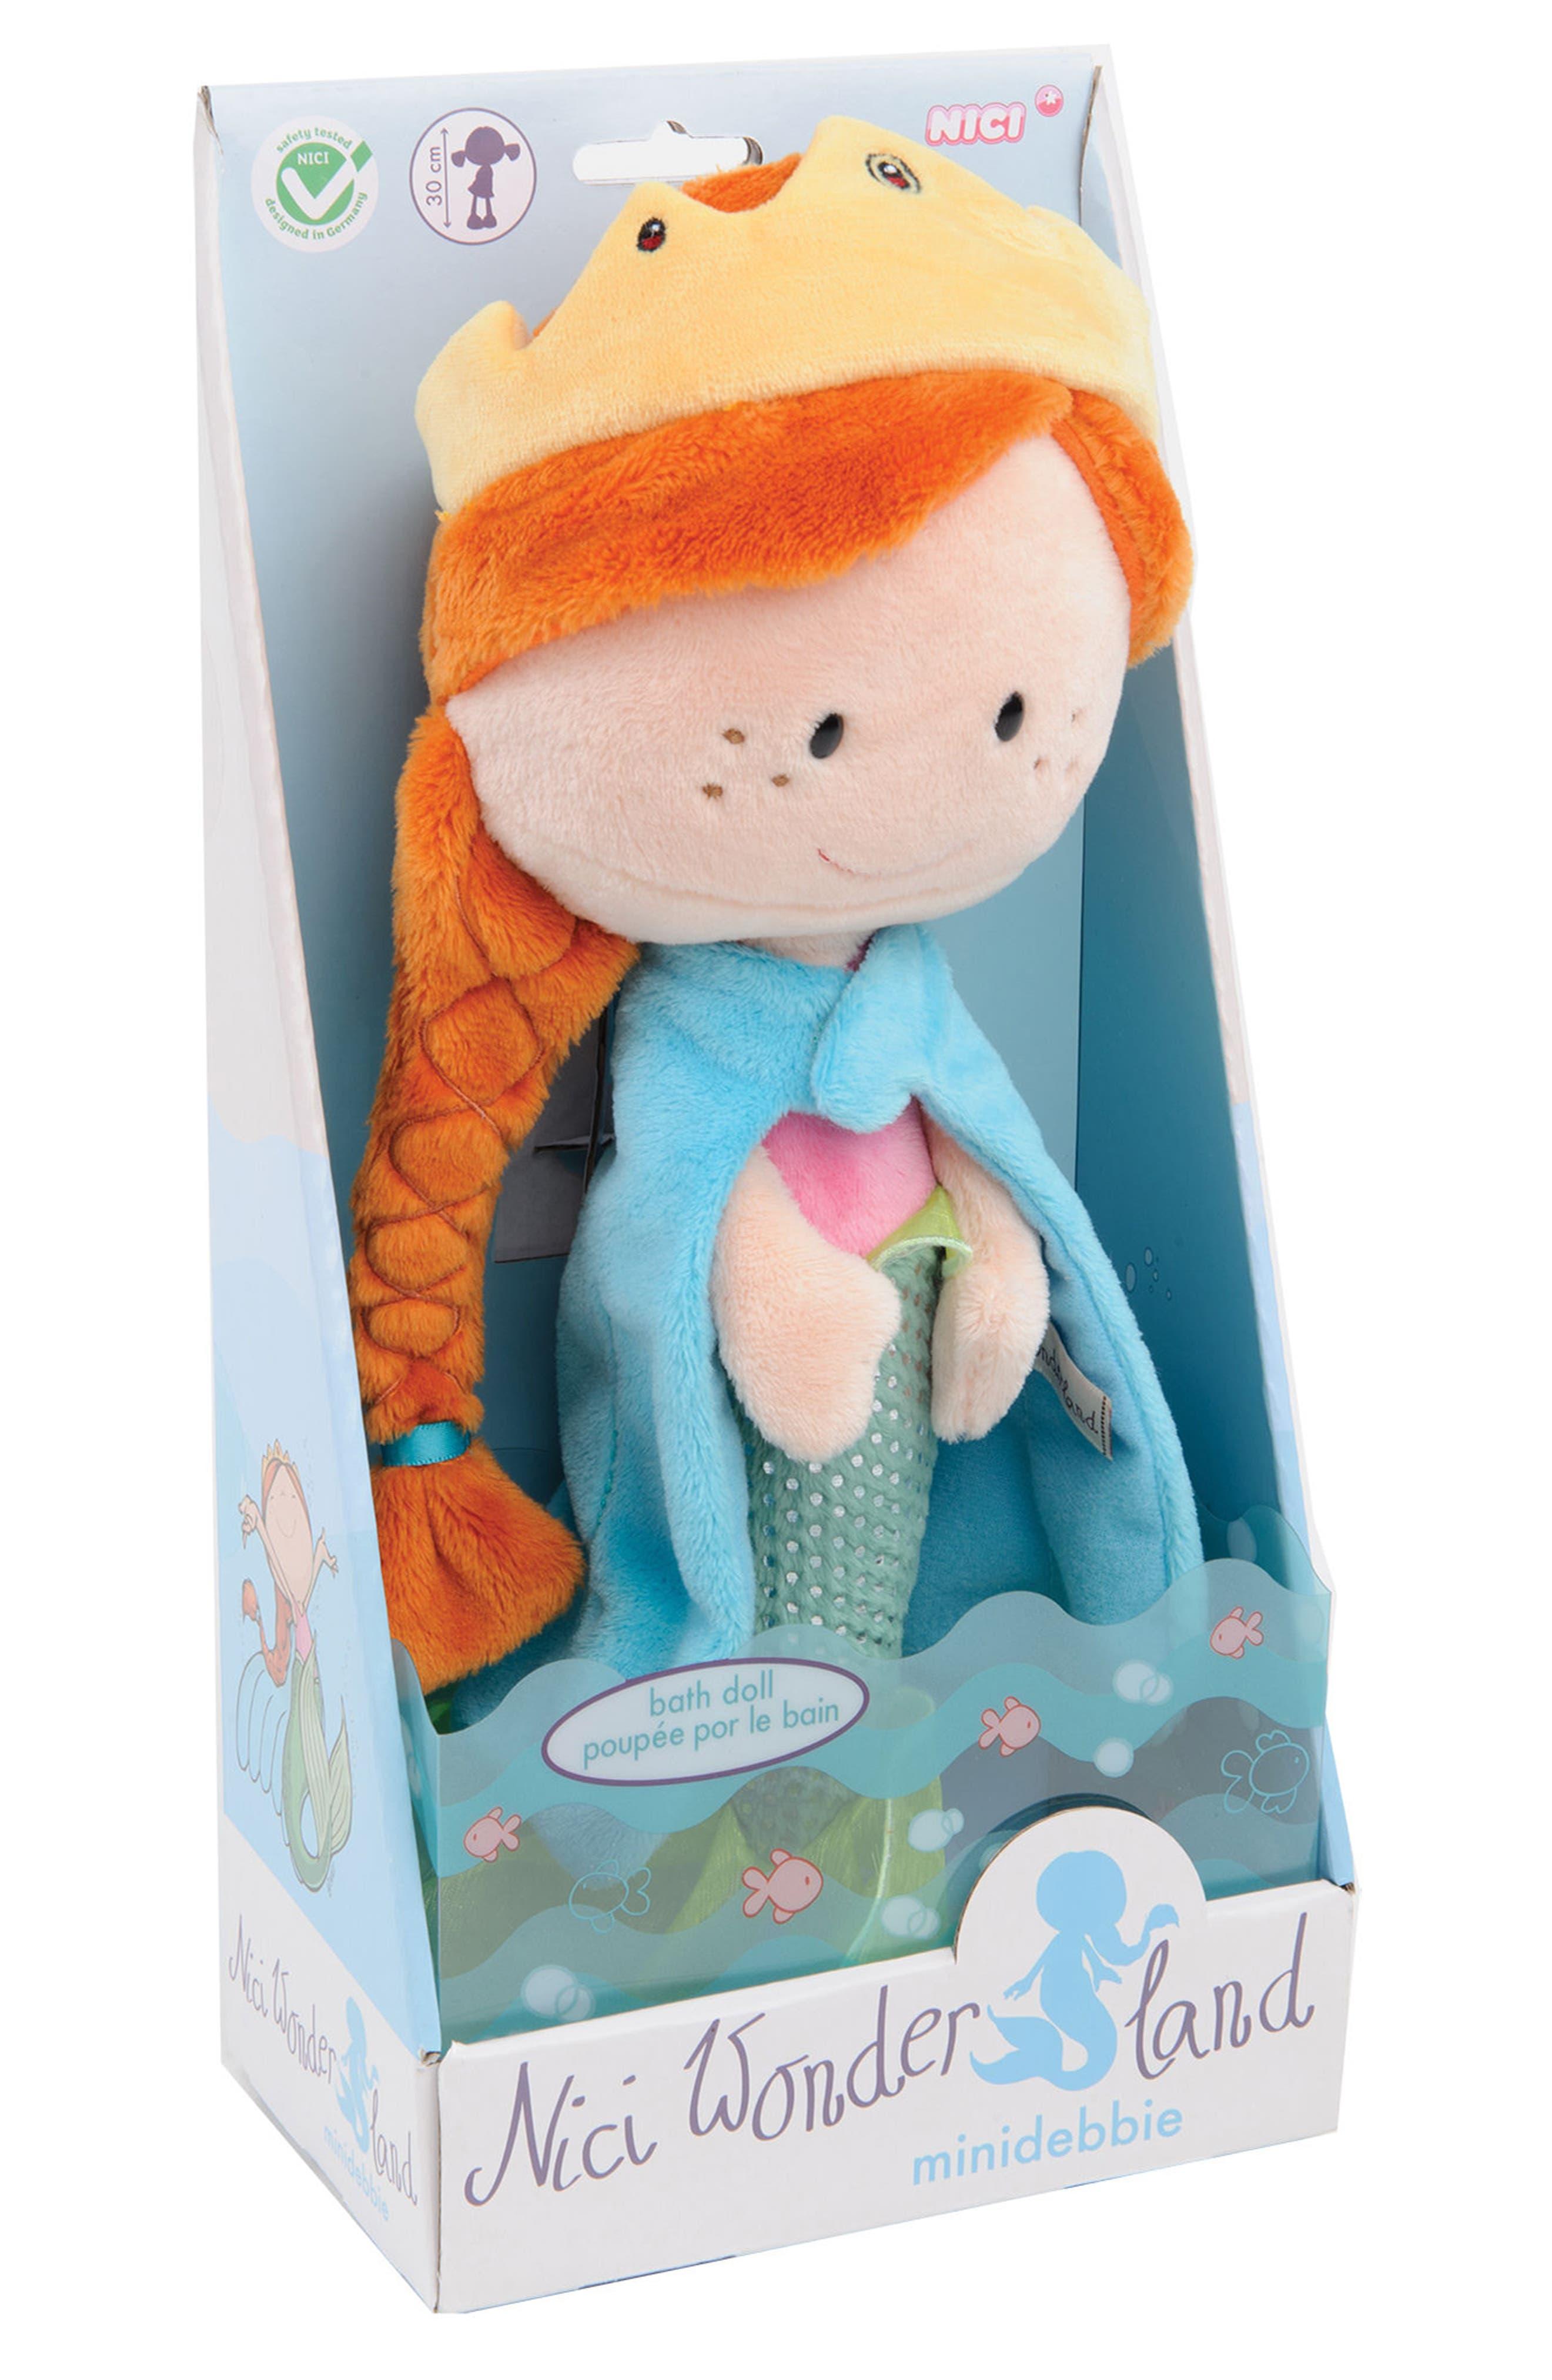 Neat Oh! Nici<sup>®</sup> Wonderland Minidebbie the Mermaid Plush Doll,                         Main,                         color, Blue